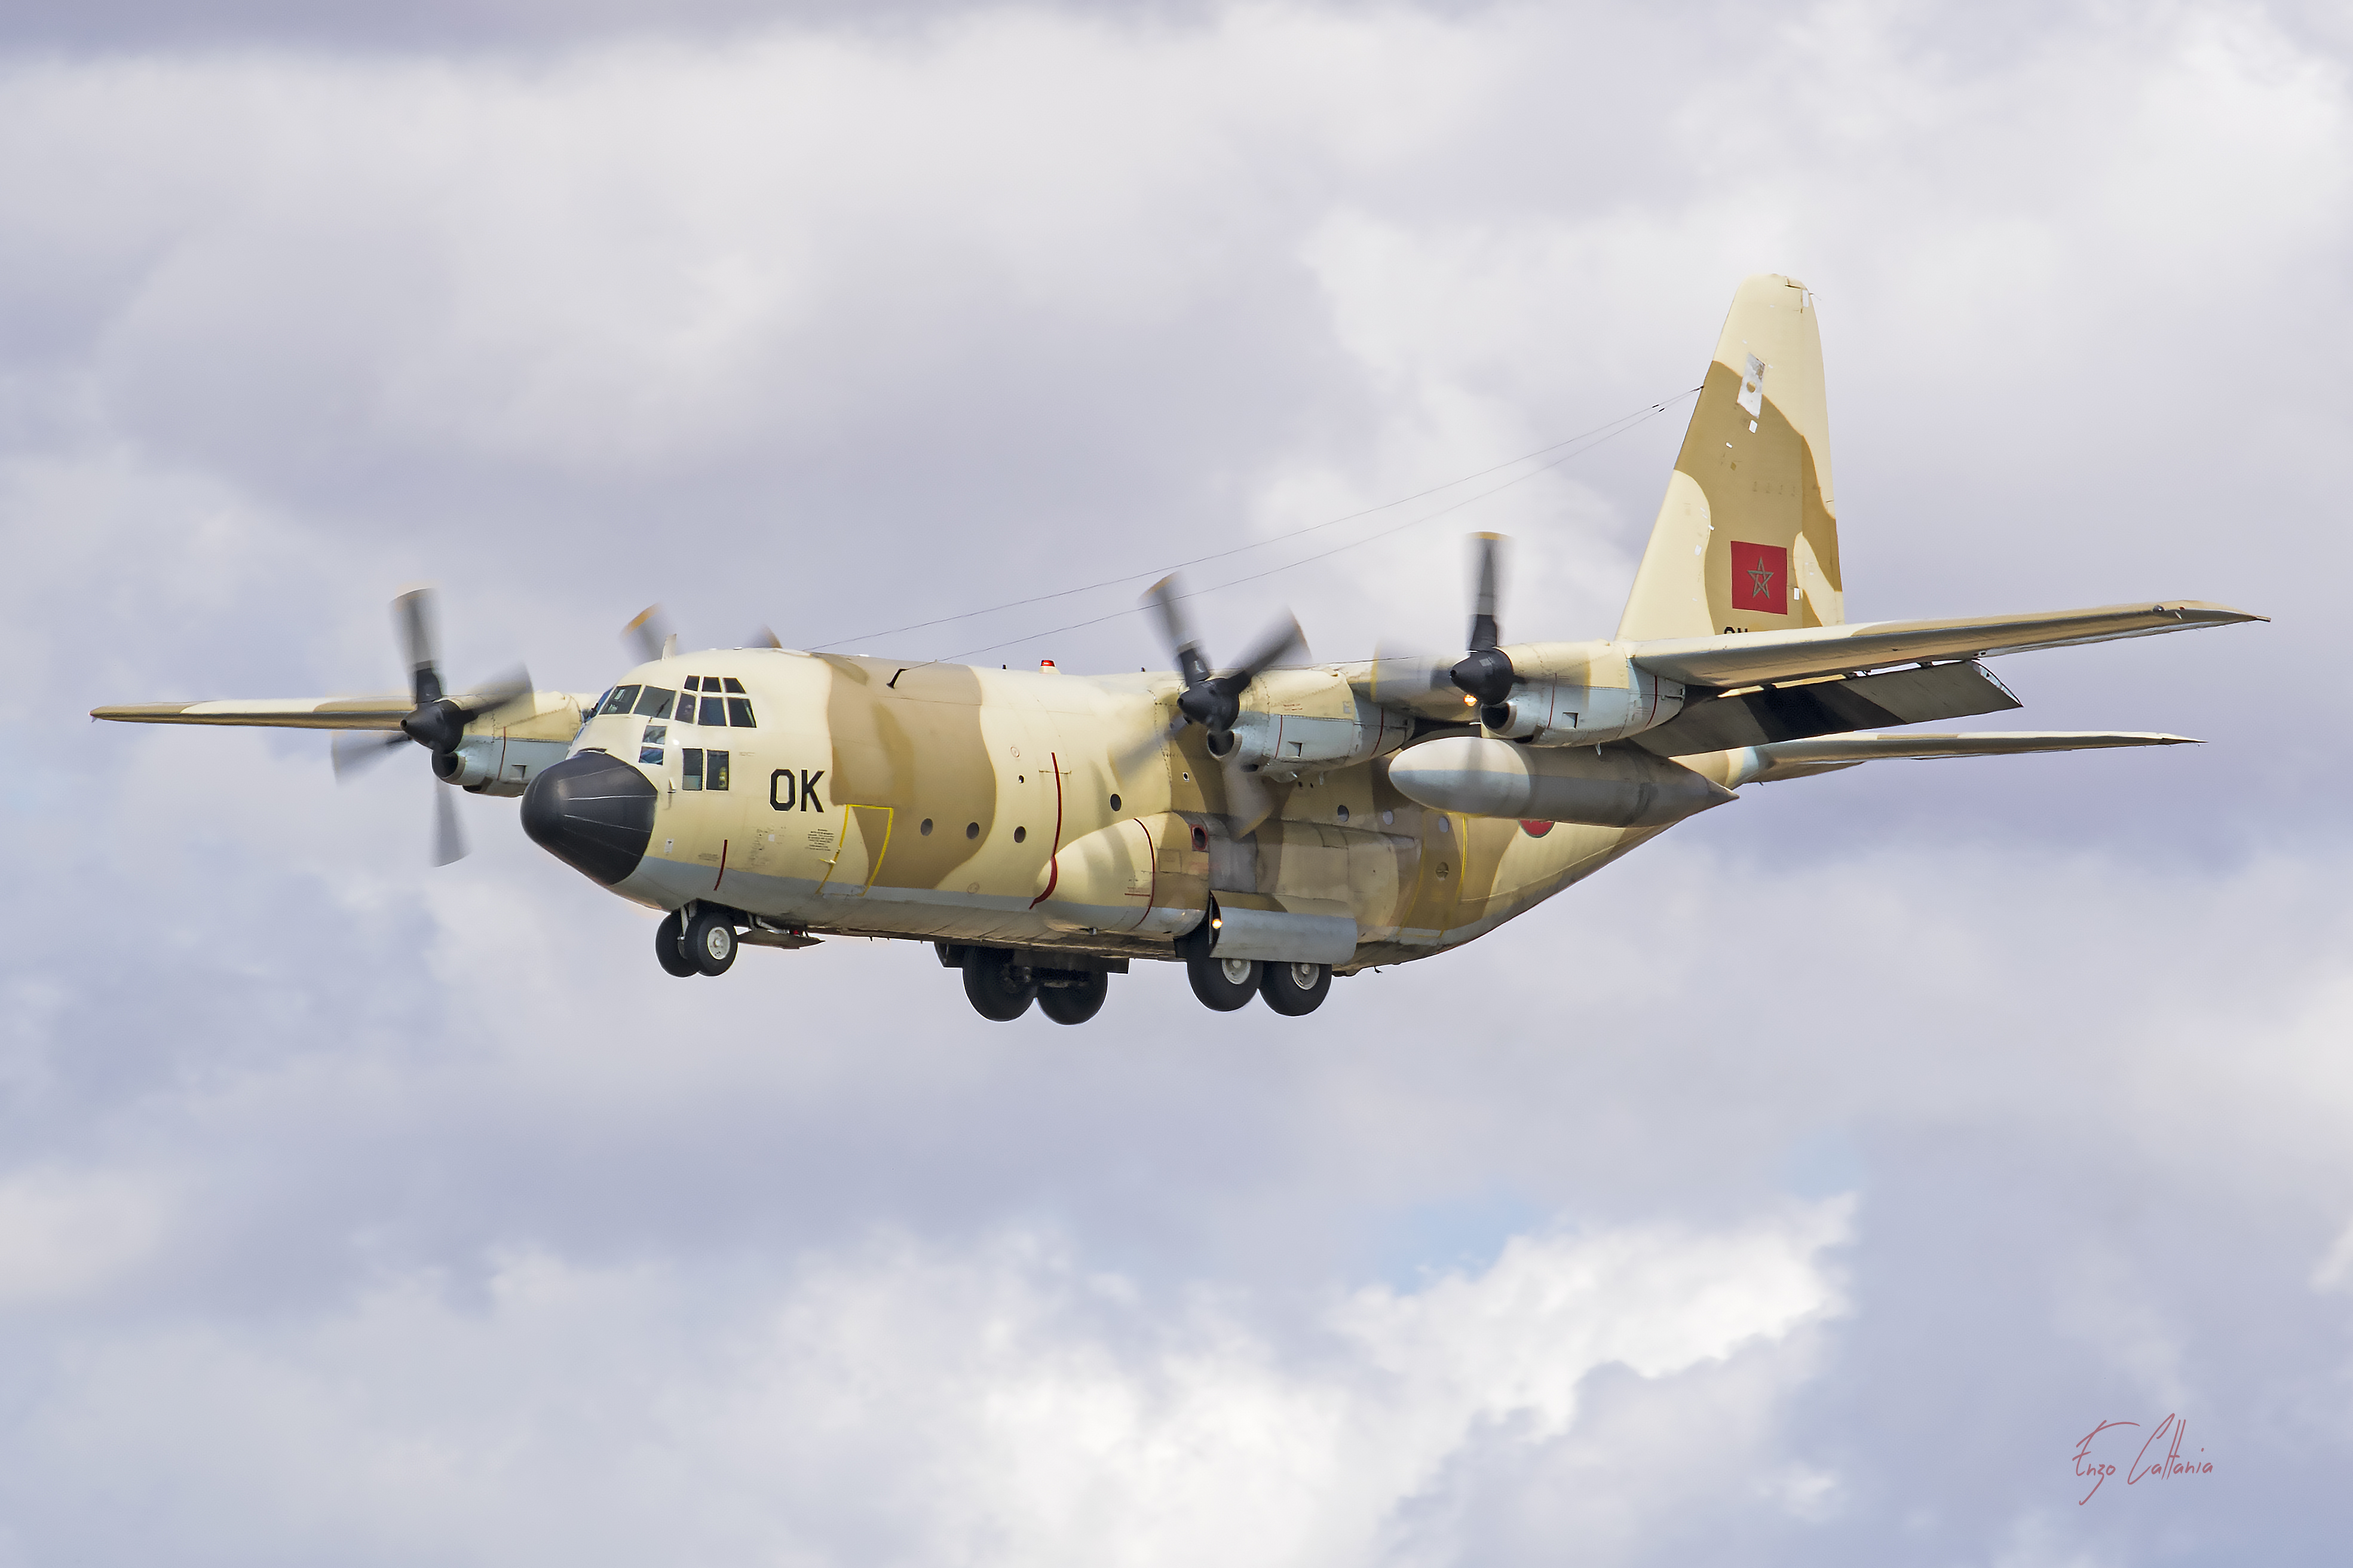 FRA: Photos d'avions de transport - Page 41 50293909866_60f38547a5_o_d